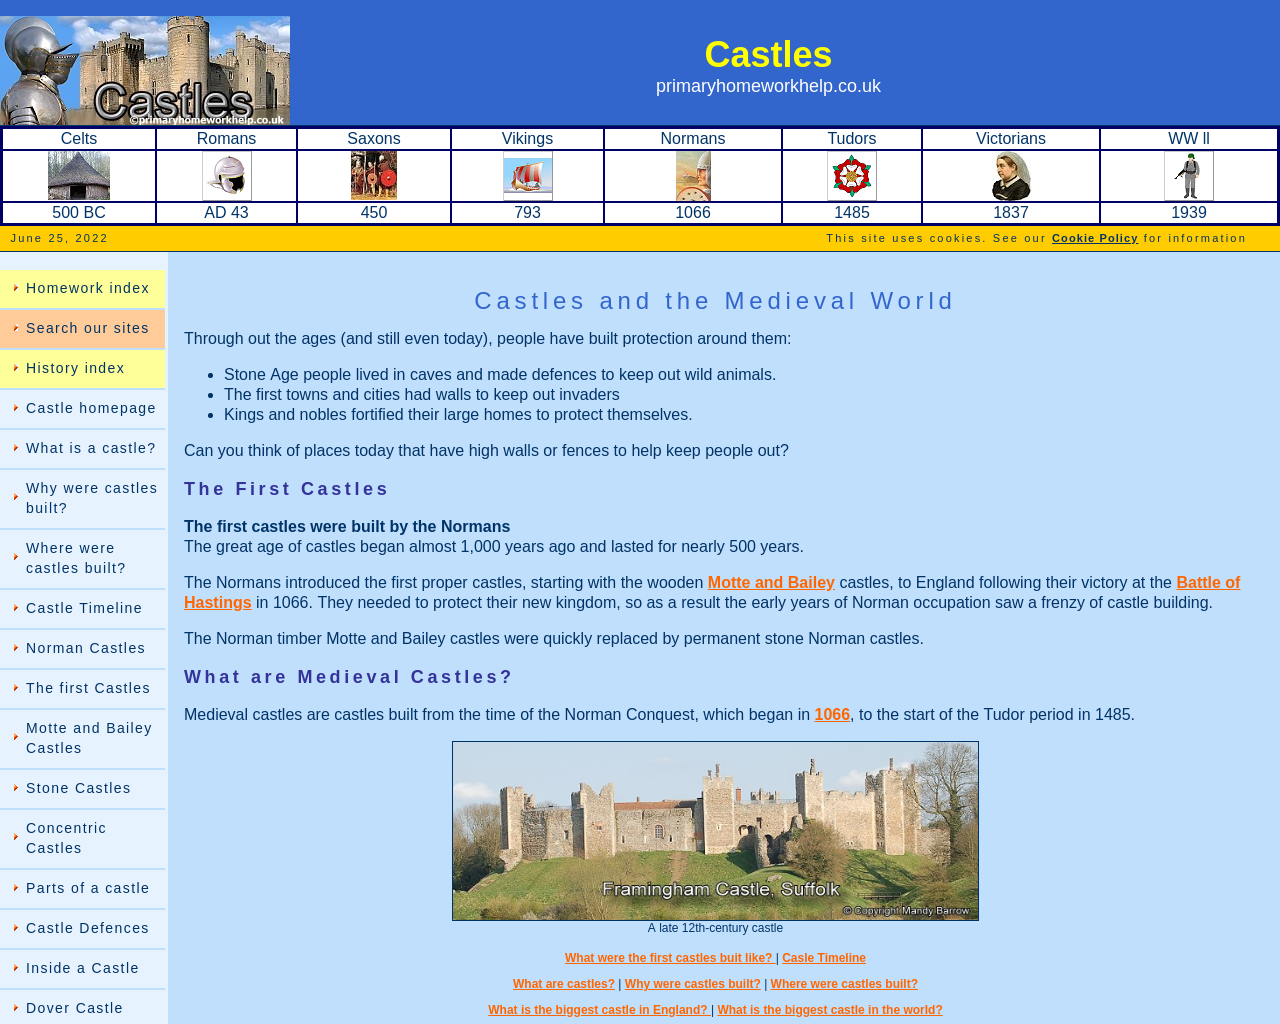 Catles